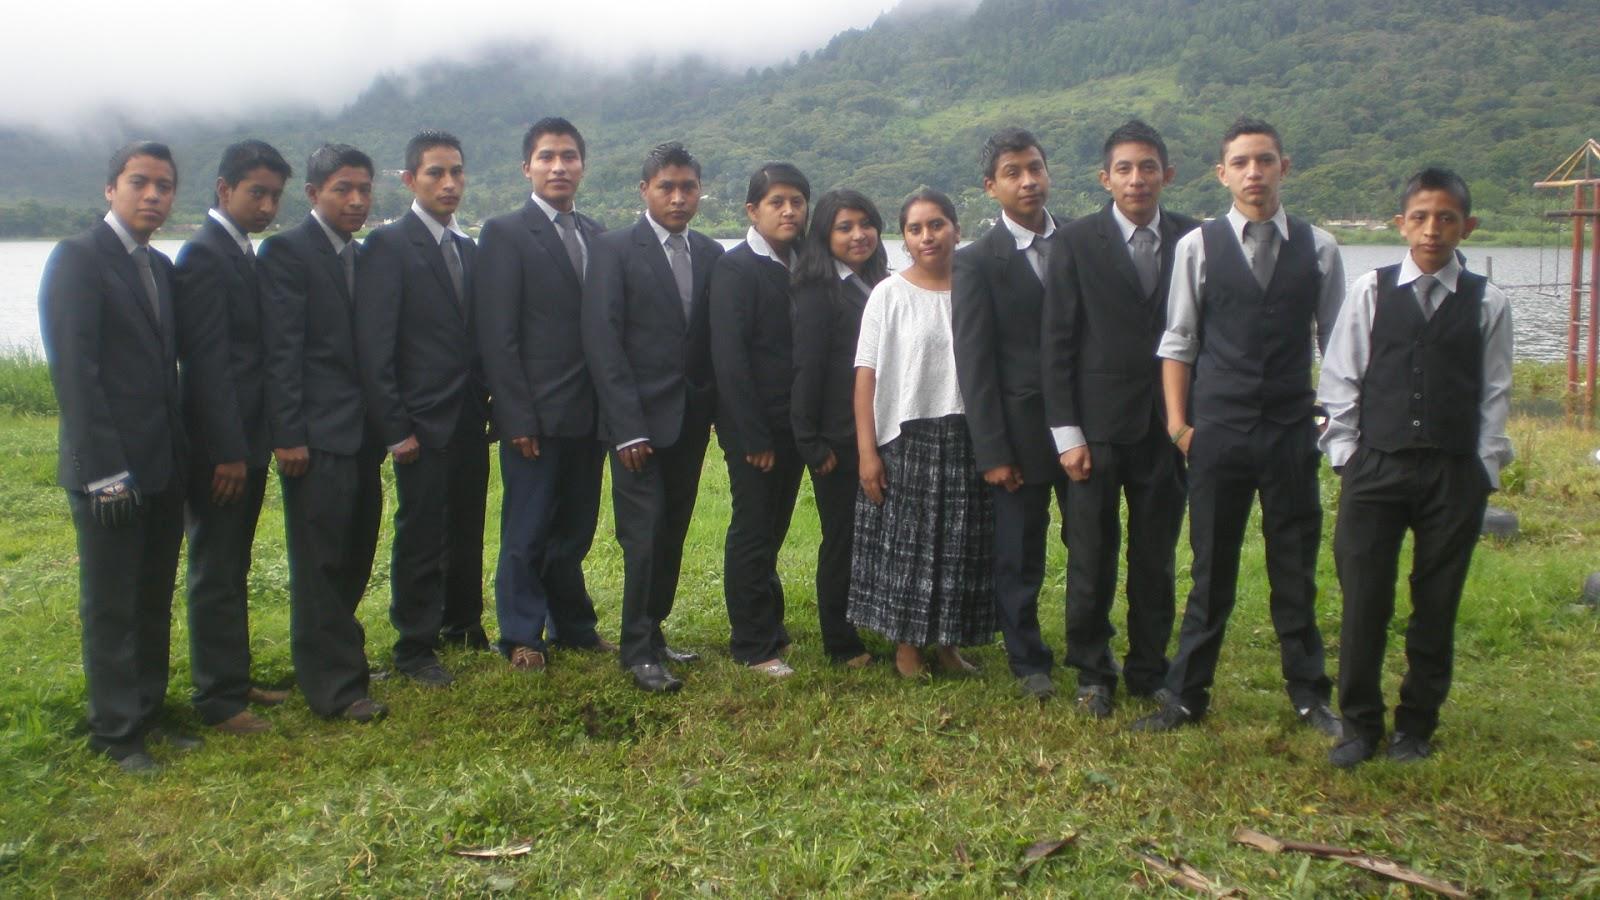 Liceo san cristobal verapaz rica chica - 1 8